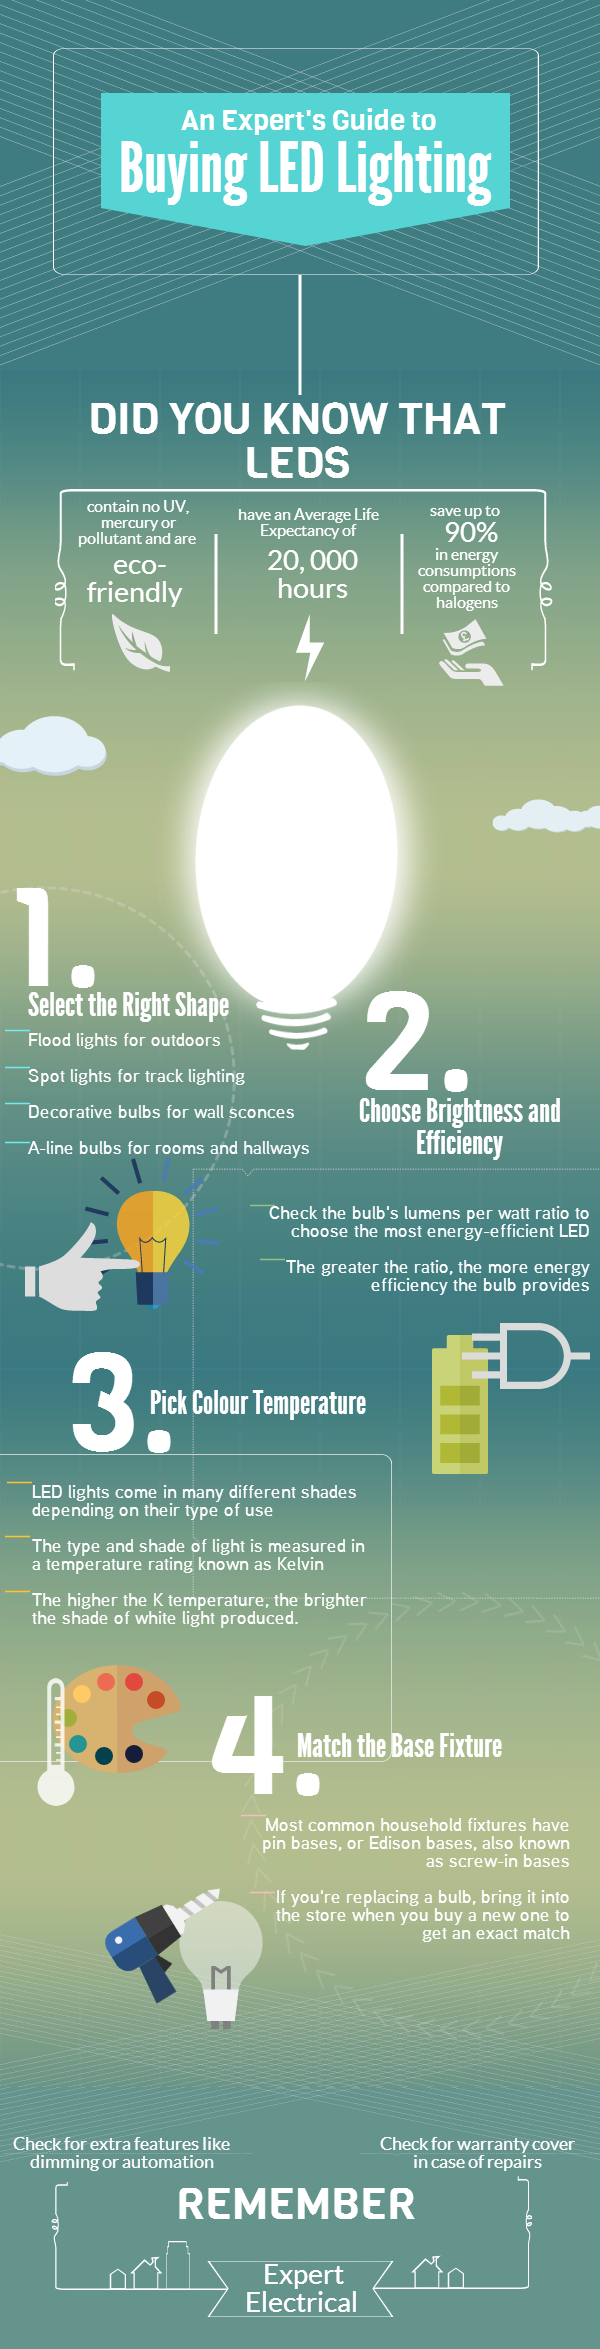 Cost Comparison Leds Vs Traditional Halogen Lighting Infographic Lighting Guide Recessed Lighting Halogen Lighting